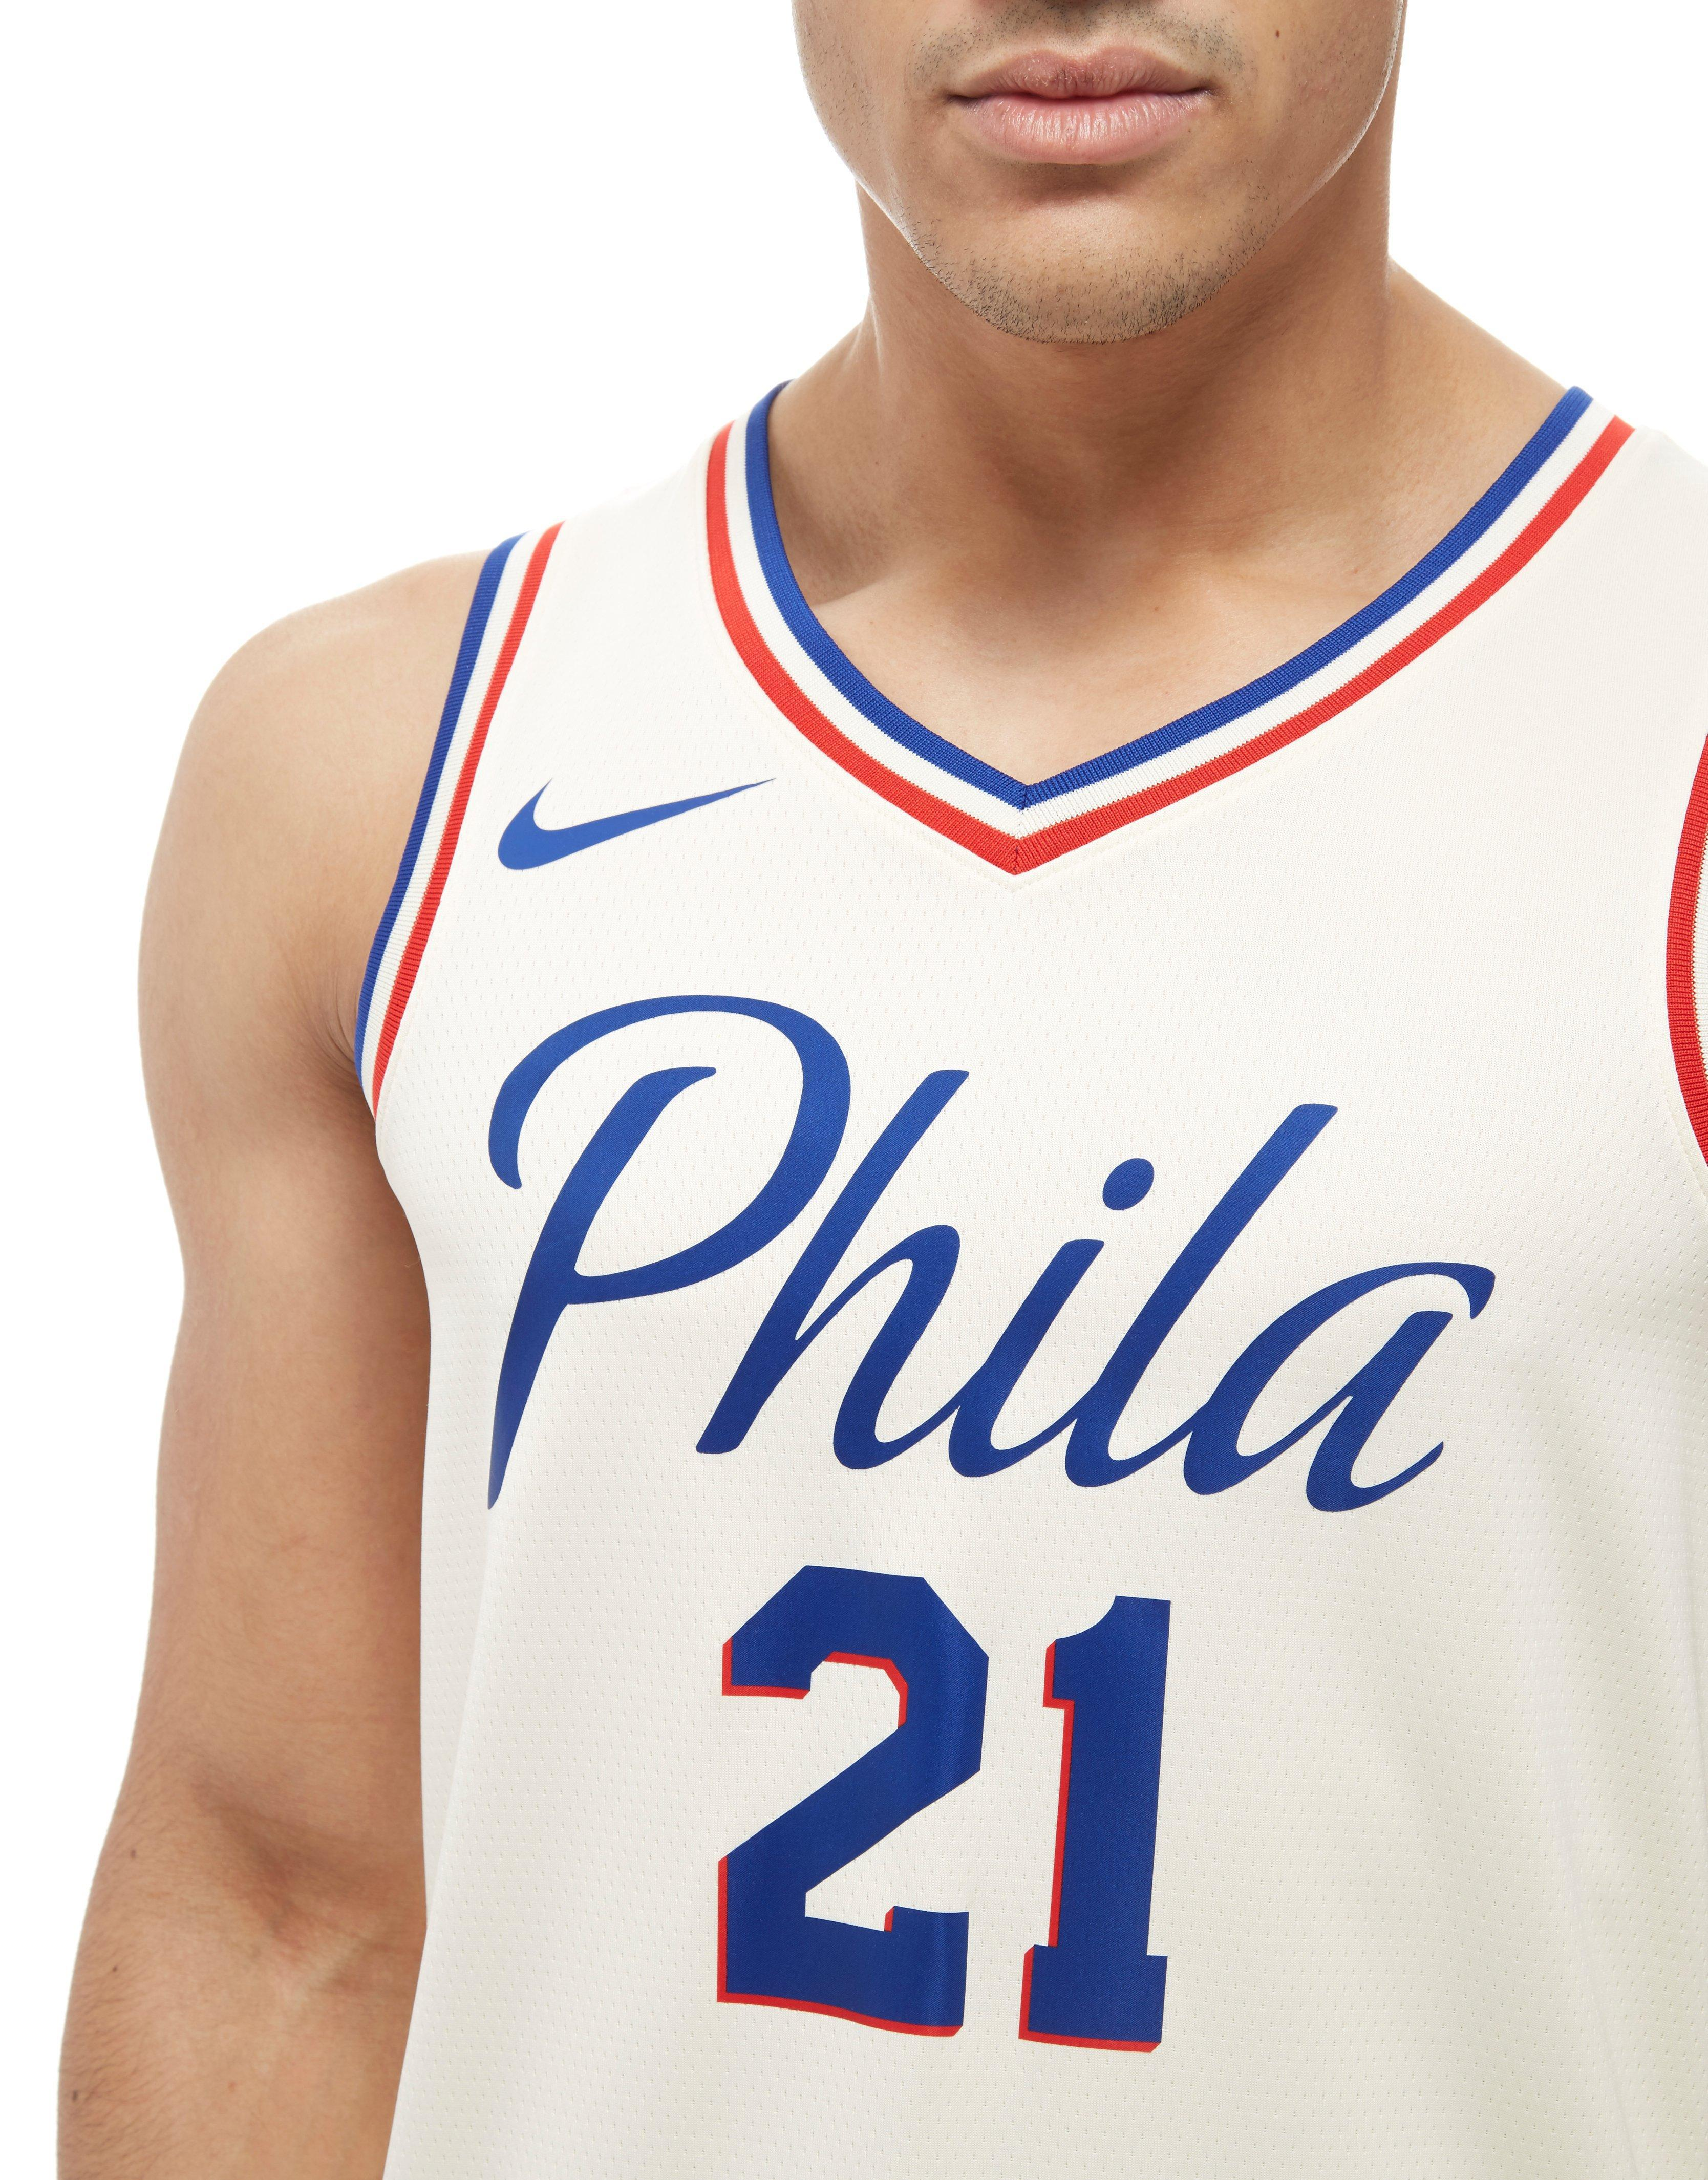 663eb2650 Nike Nba Embiid Philadelphia 76ers City Jersey in White for Men - Lyst